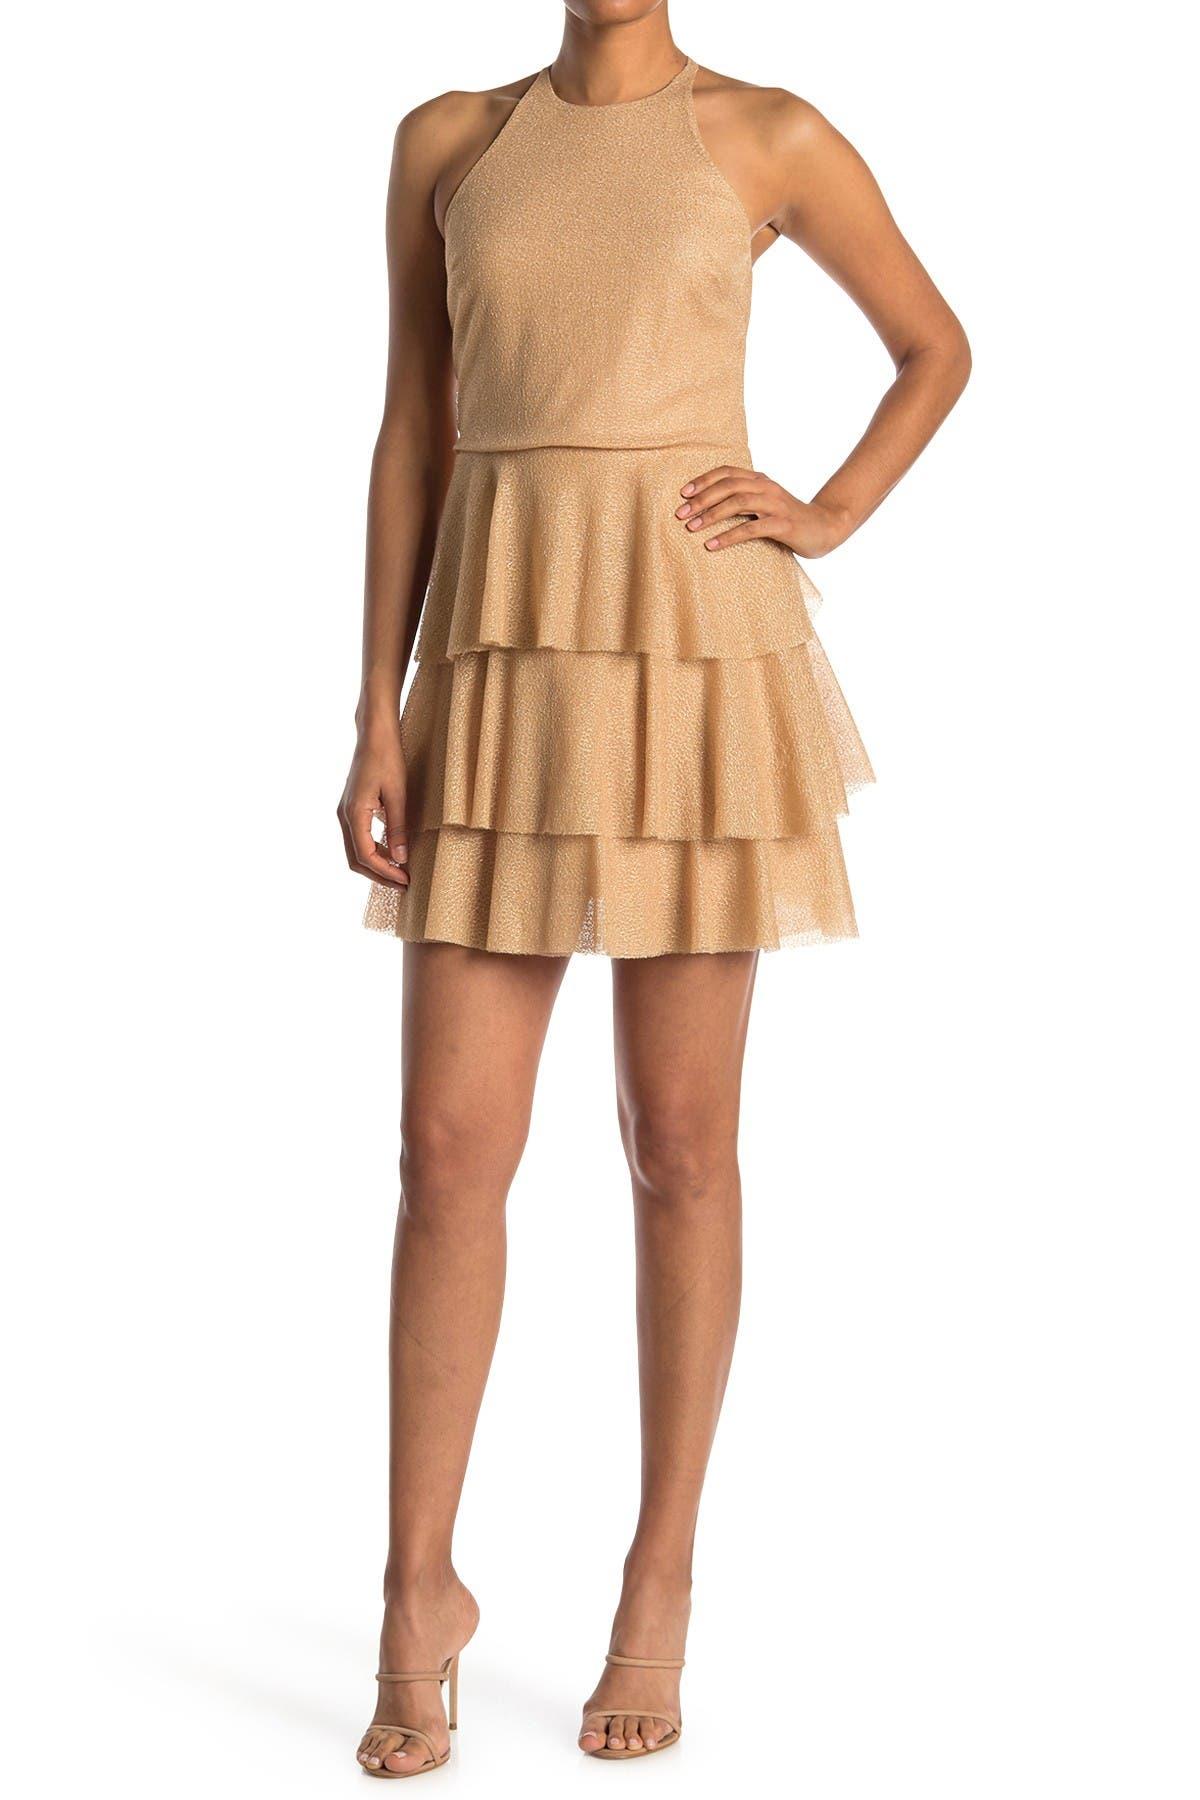 Image of HALSTON High Neck Tiered Skirt Dress